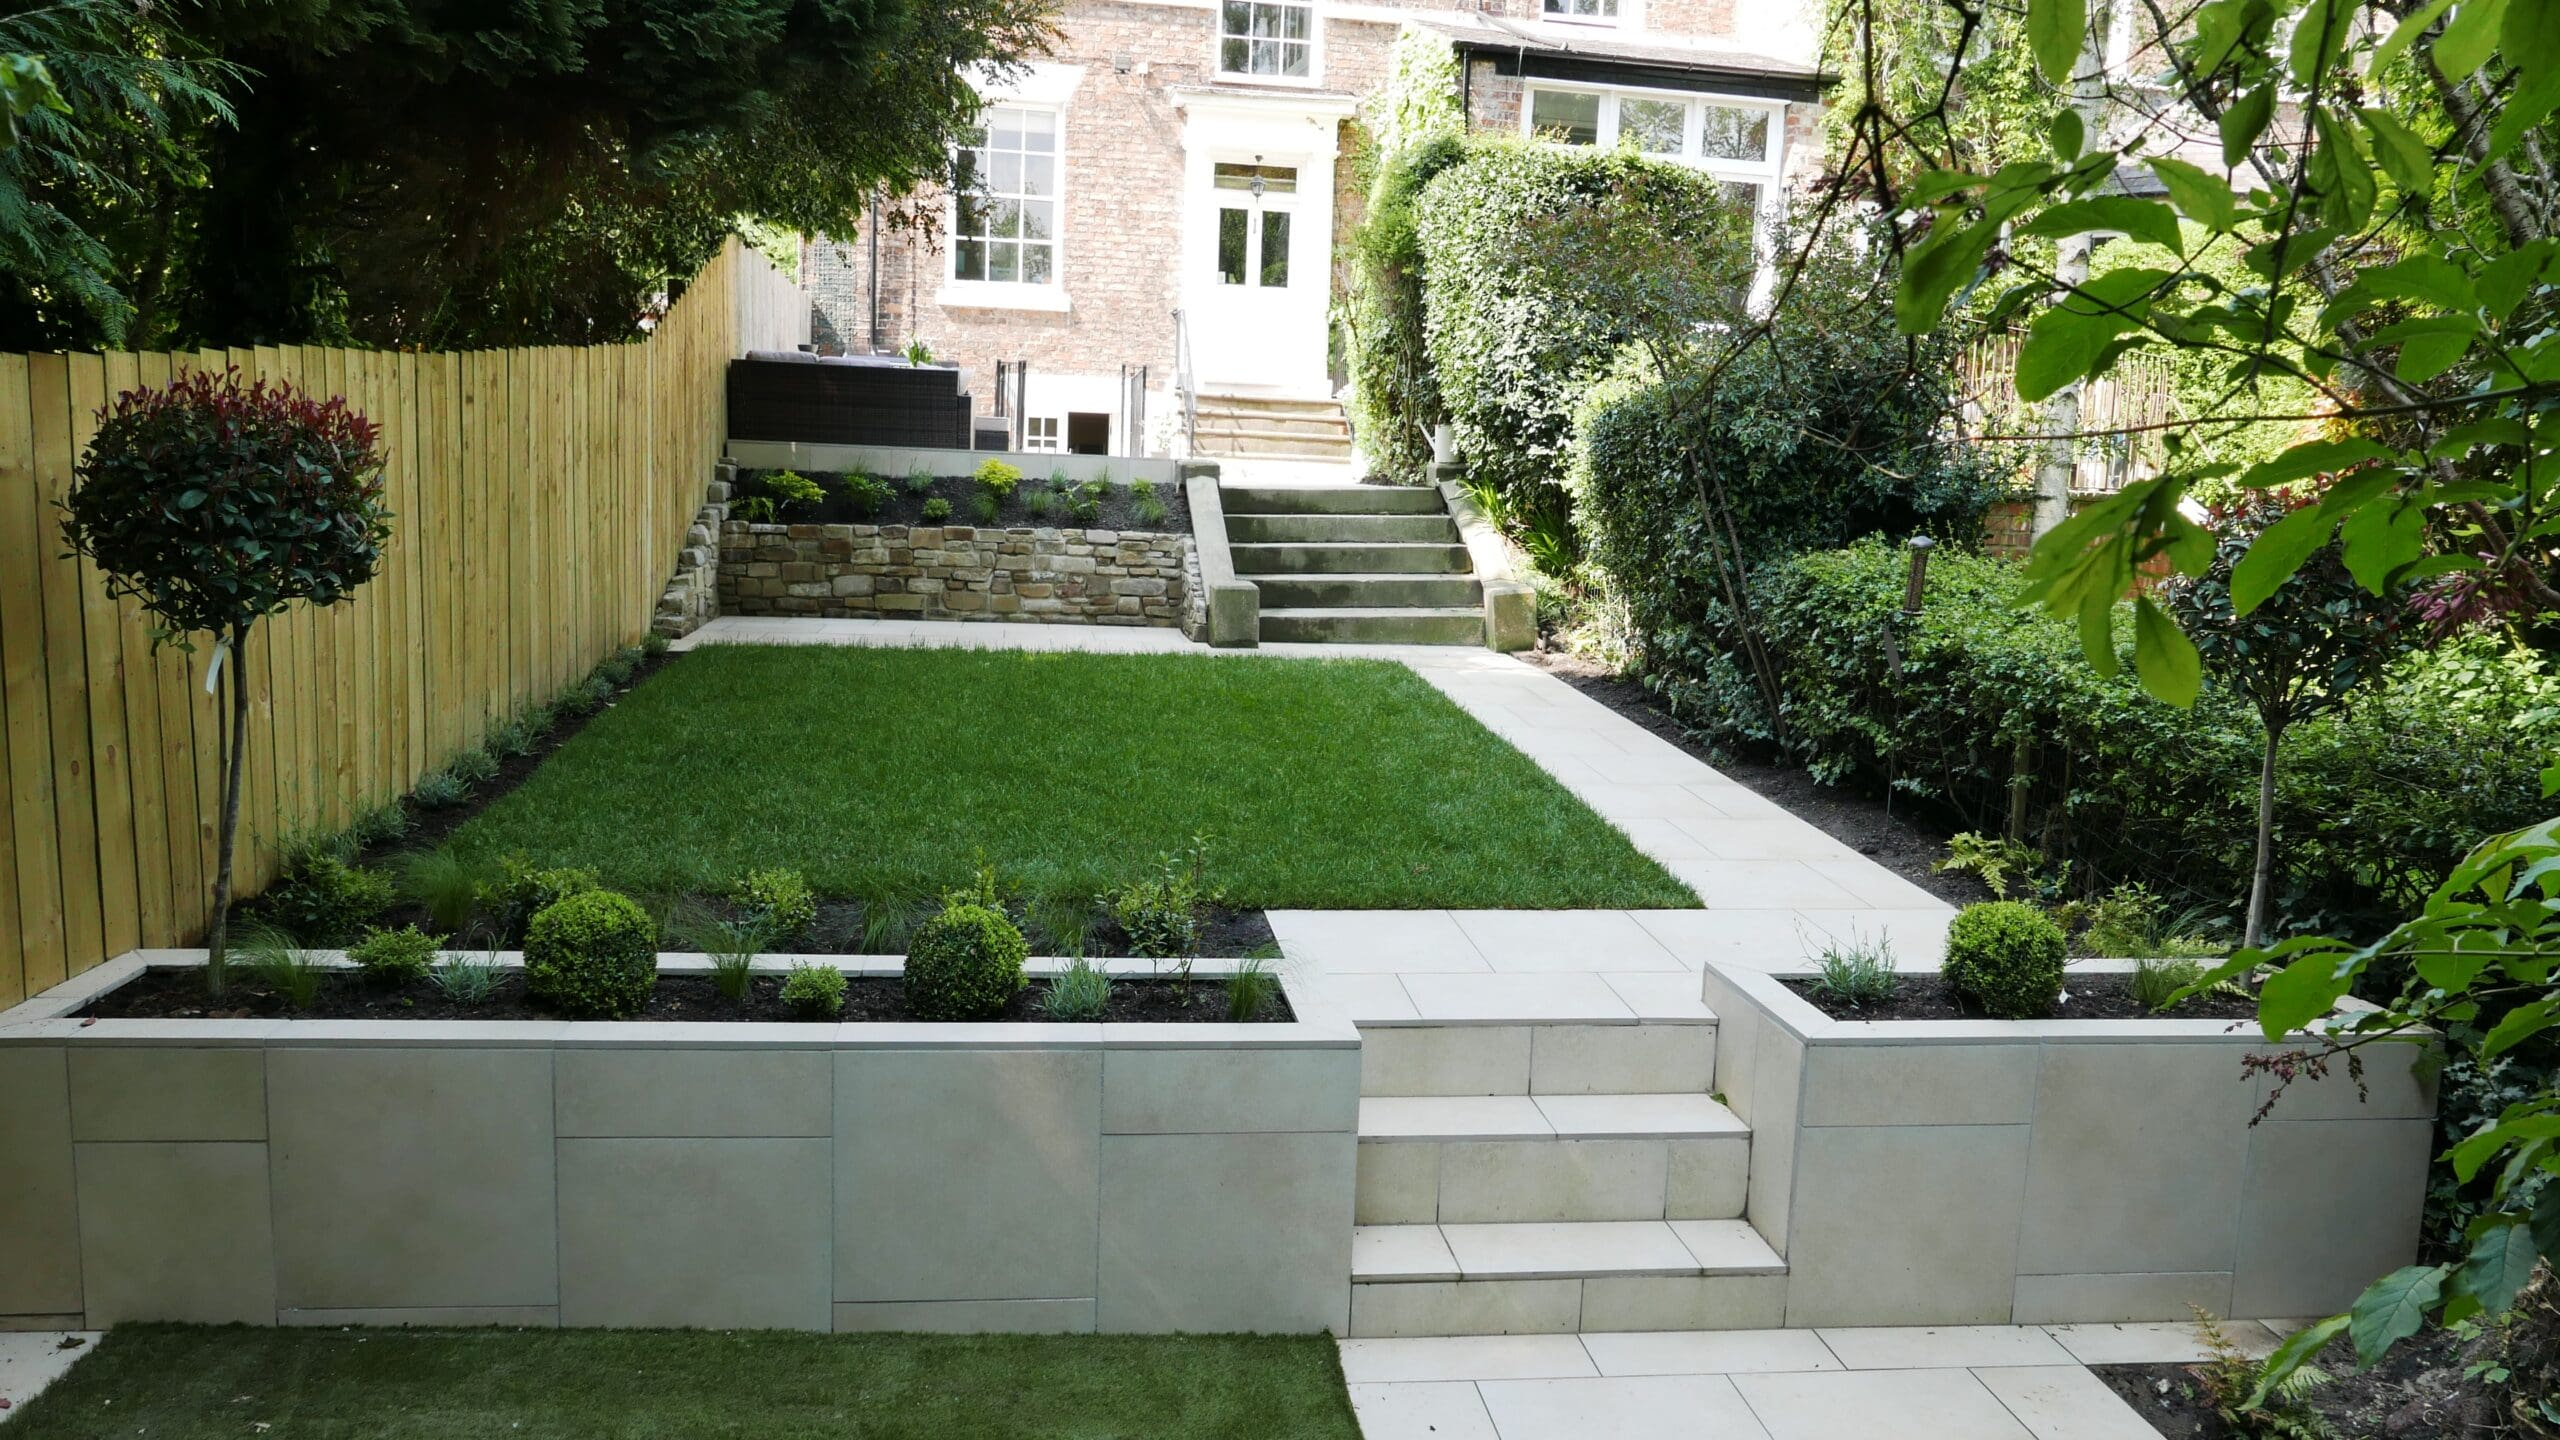 sam-nattress-gardens-projects-darlington-georgian-townhouse-terraced-levels-contrasting-textures